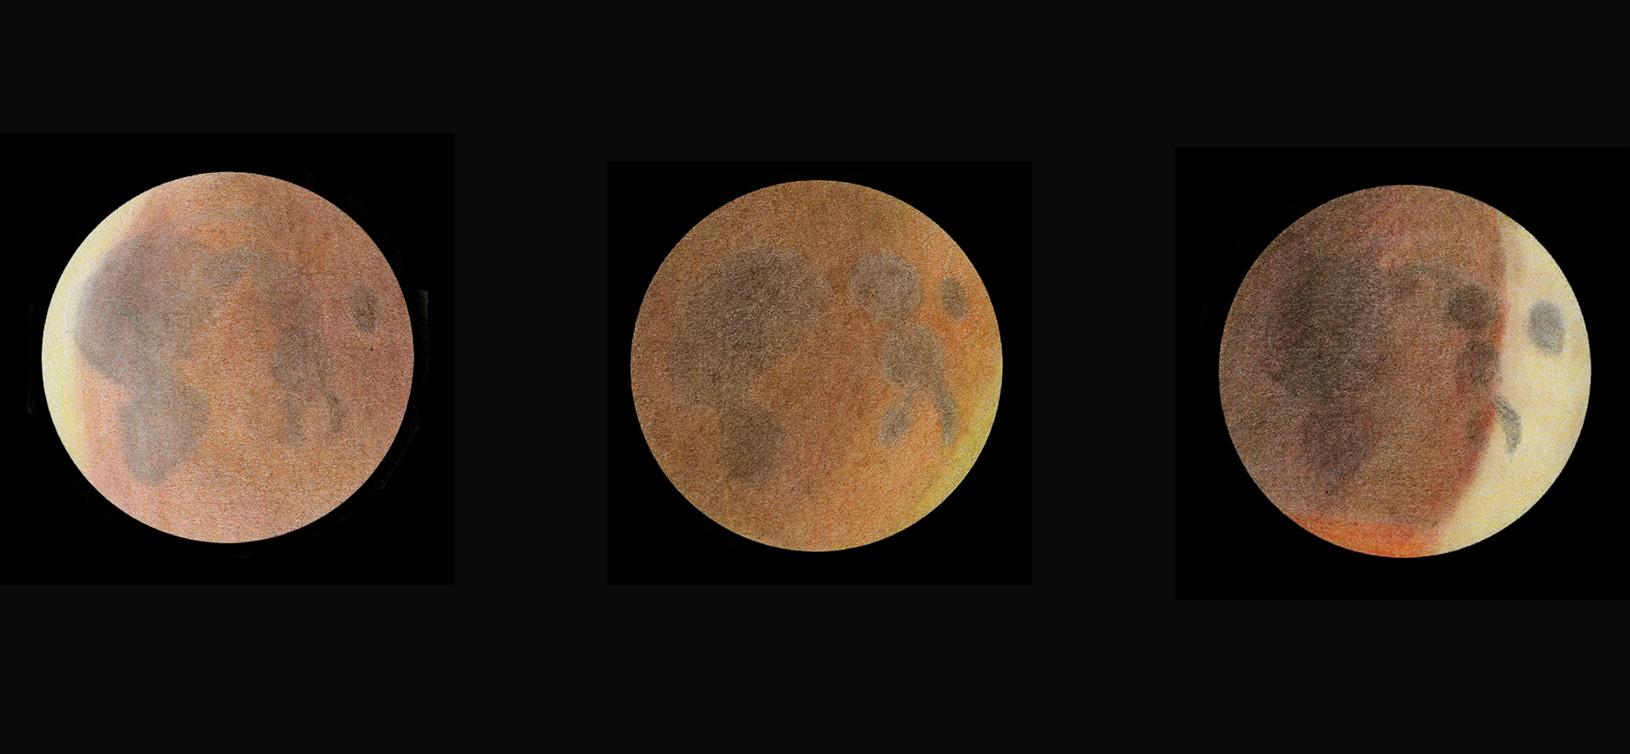 eclipse de lune 28 09 2015.jpg